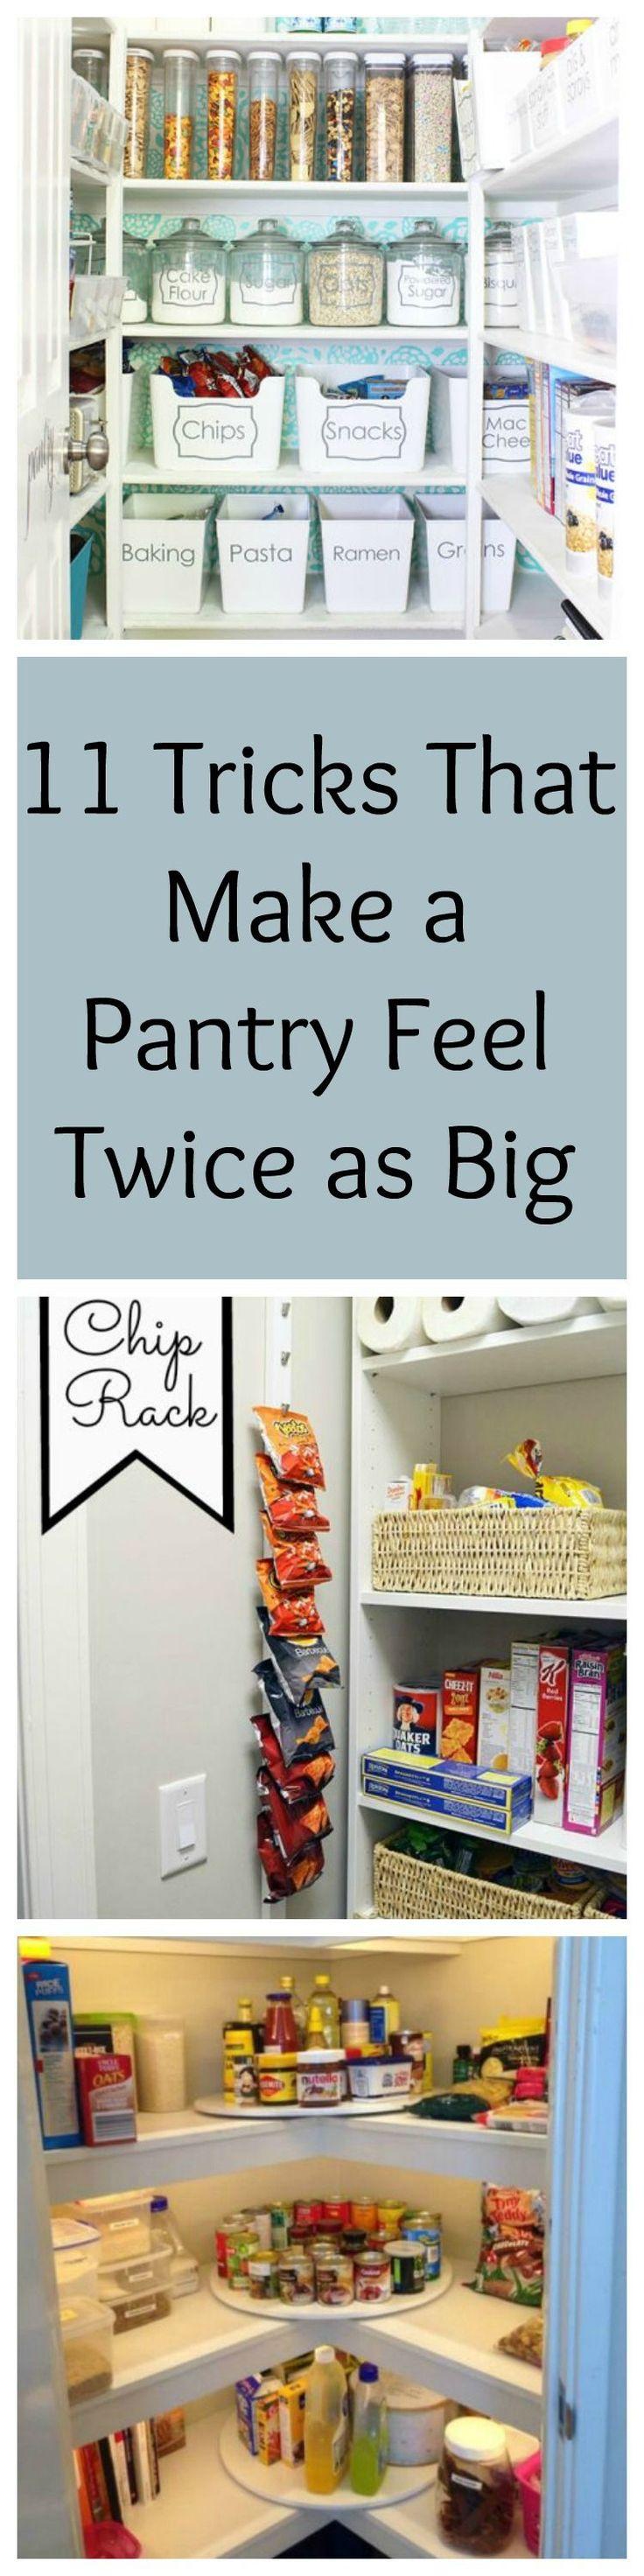 53 best Pantry Design images on Pinterest | Pantry, Cupboard shelves ...